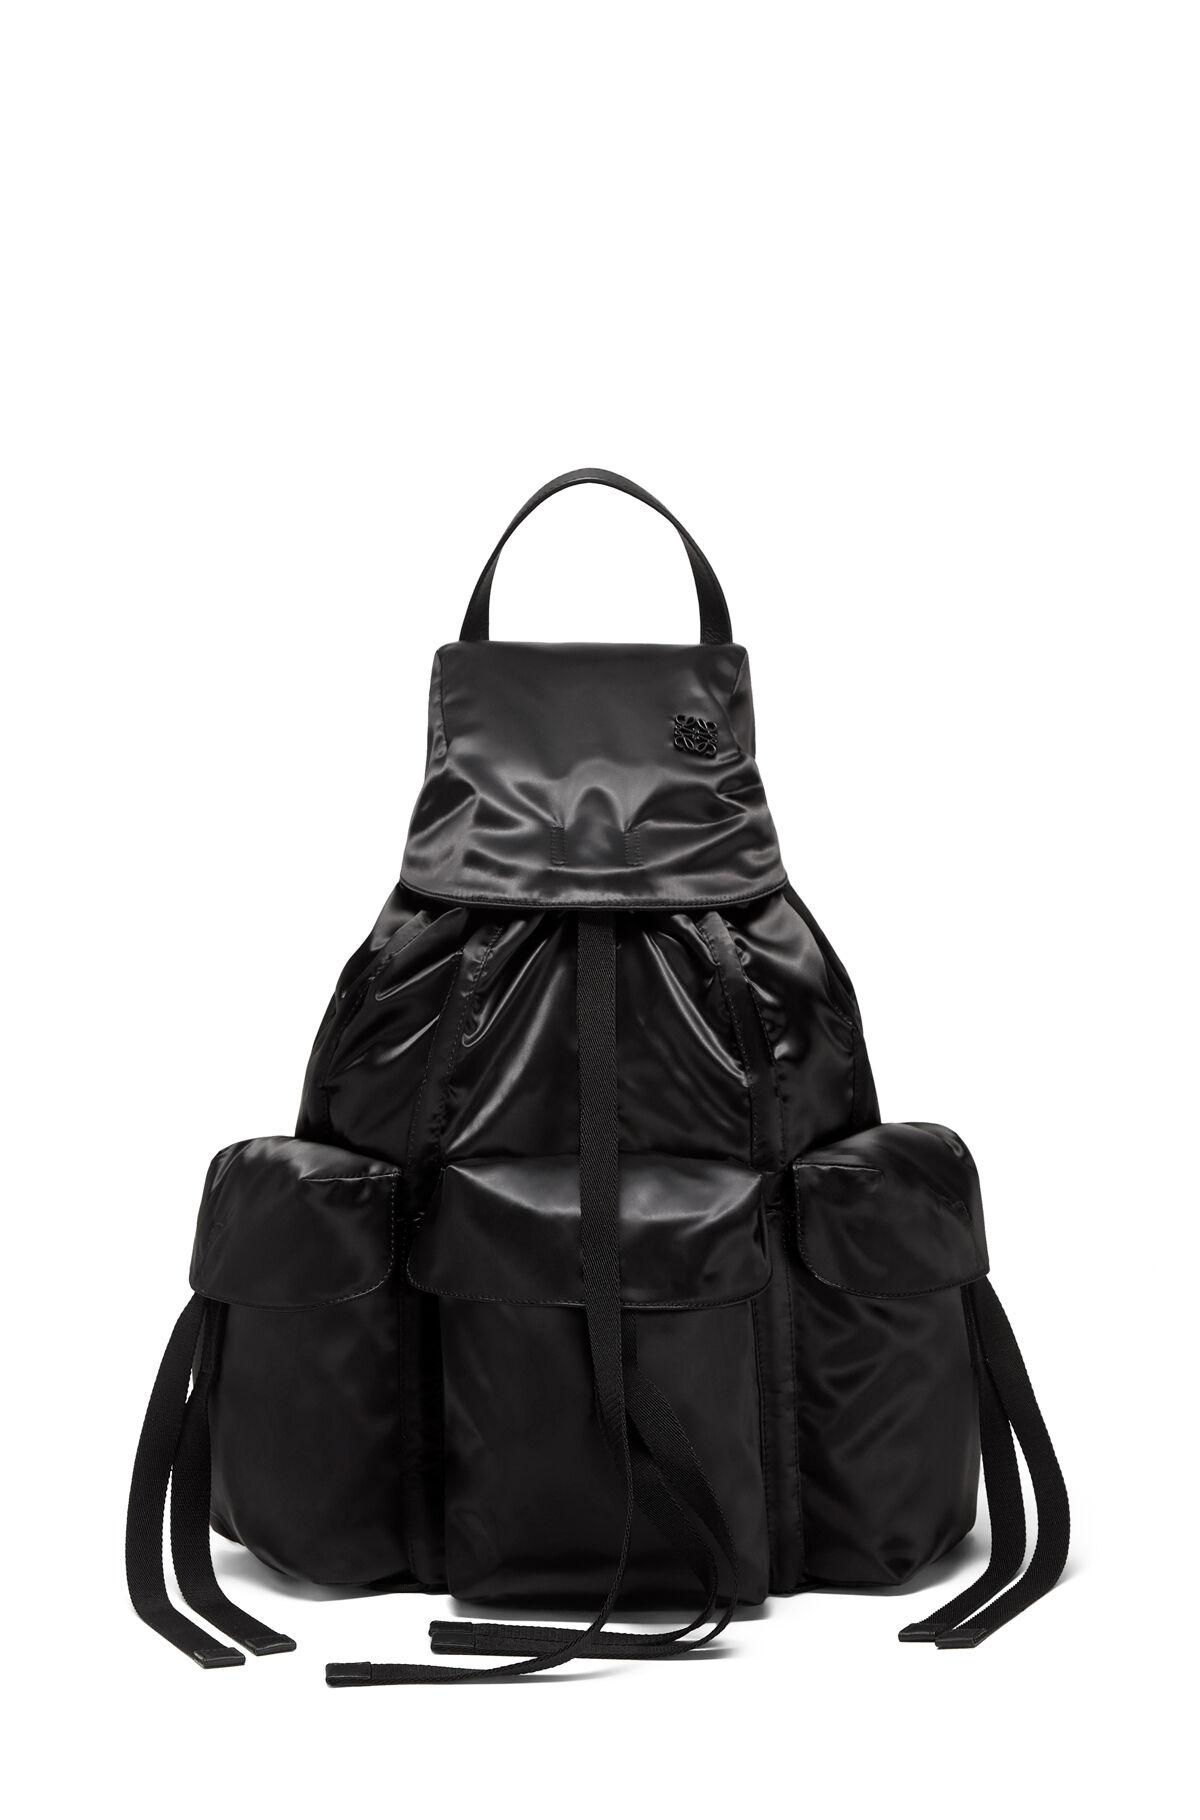 LOEWE Rucksack Black all